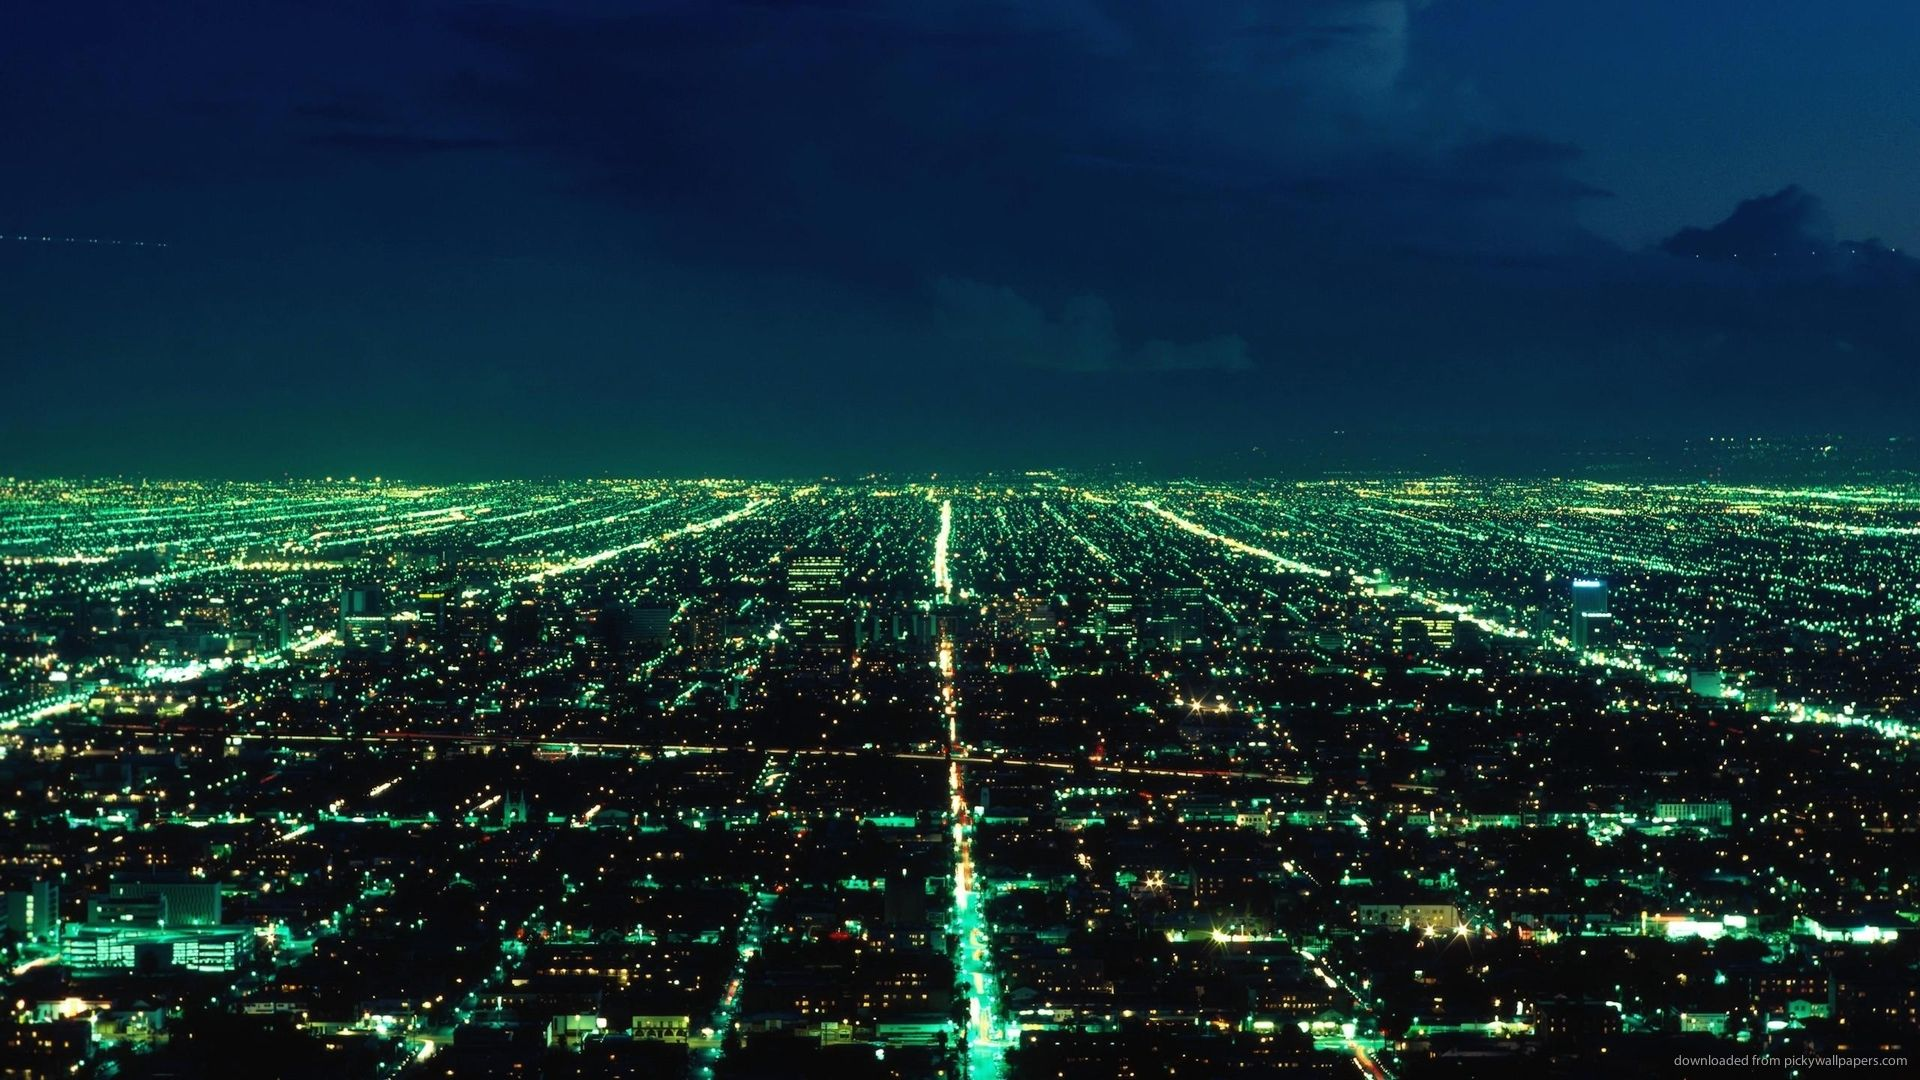 greencitylights.jpg (1920×1080) Environment